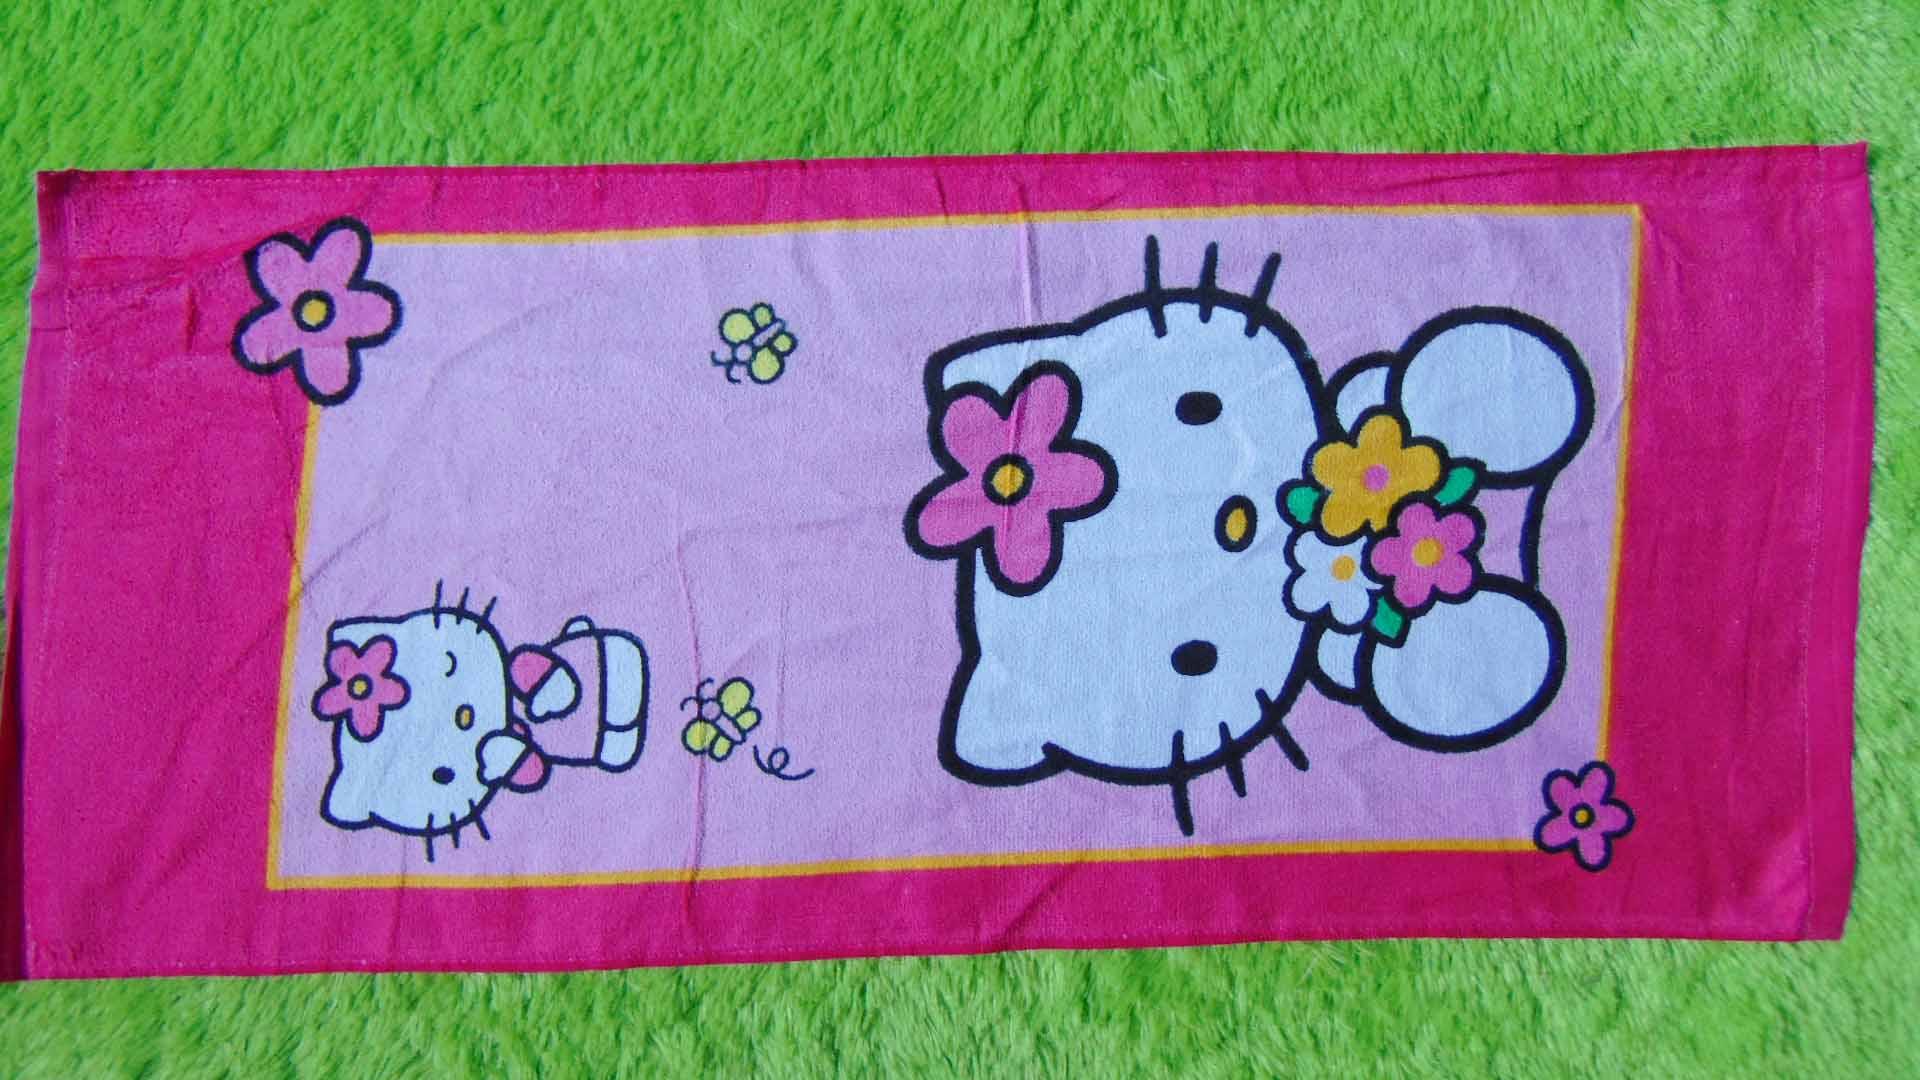 TERLARIS handuk karakter hello kitty lucu murah kado hadiah anak bayi 22 dengan motif yg disukai anak2,panjang 75cm,lebar 33cm,juga cocok untuk kado anak atau bayi